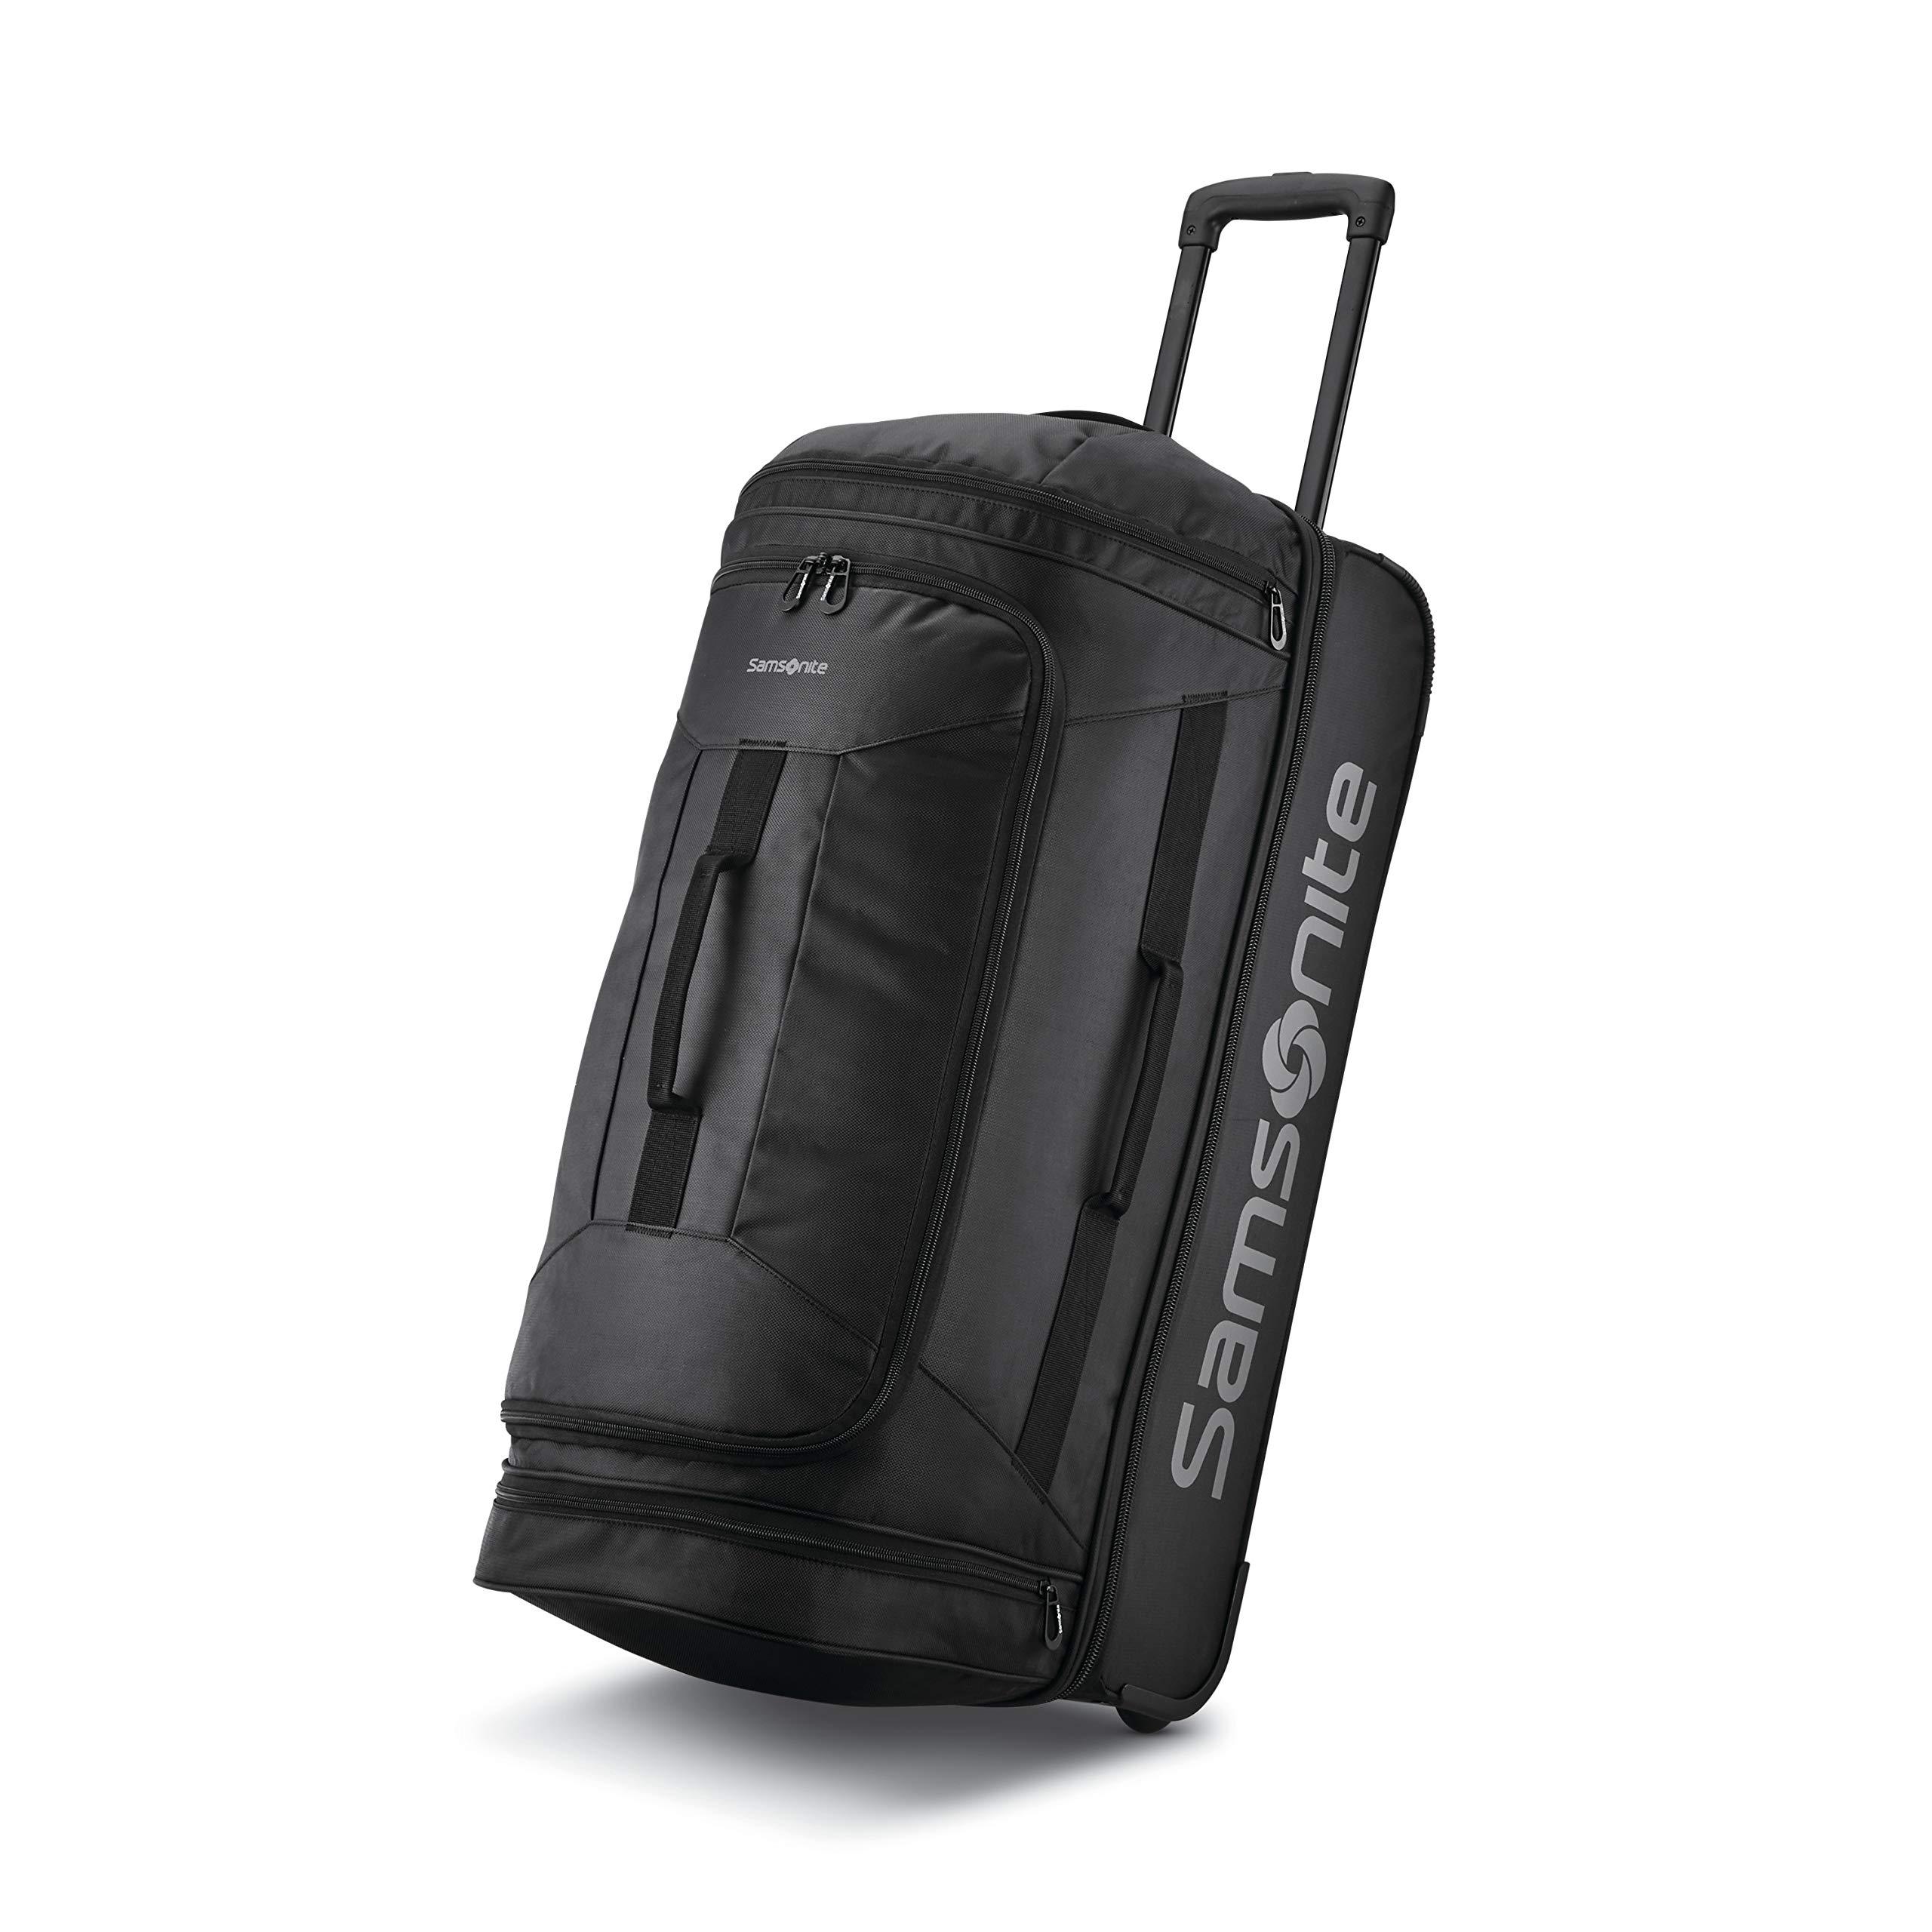 Andante 2 Drop Bottom Wheeled Rolling Duffel Bag All Black 28 Inch Buy Online In Faroe Islands At Faroe Desertcart Com Productid 101121042